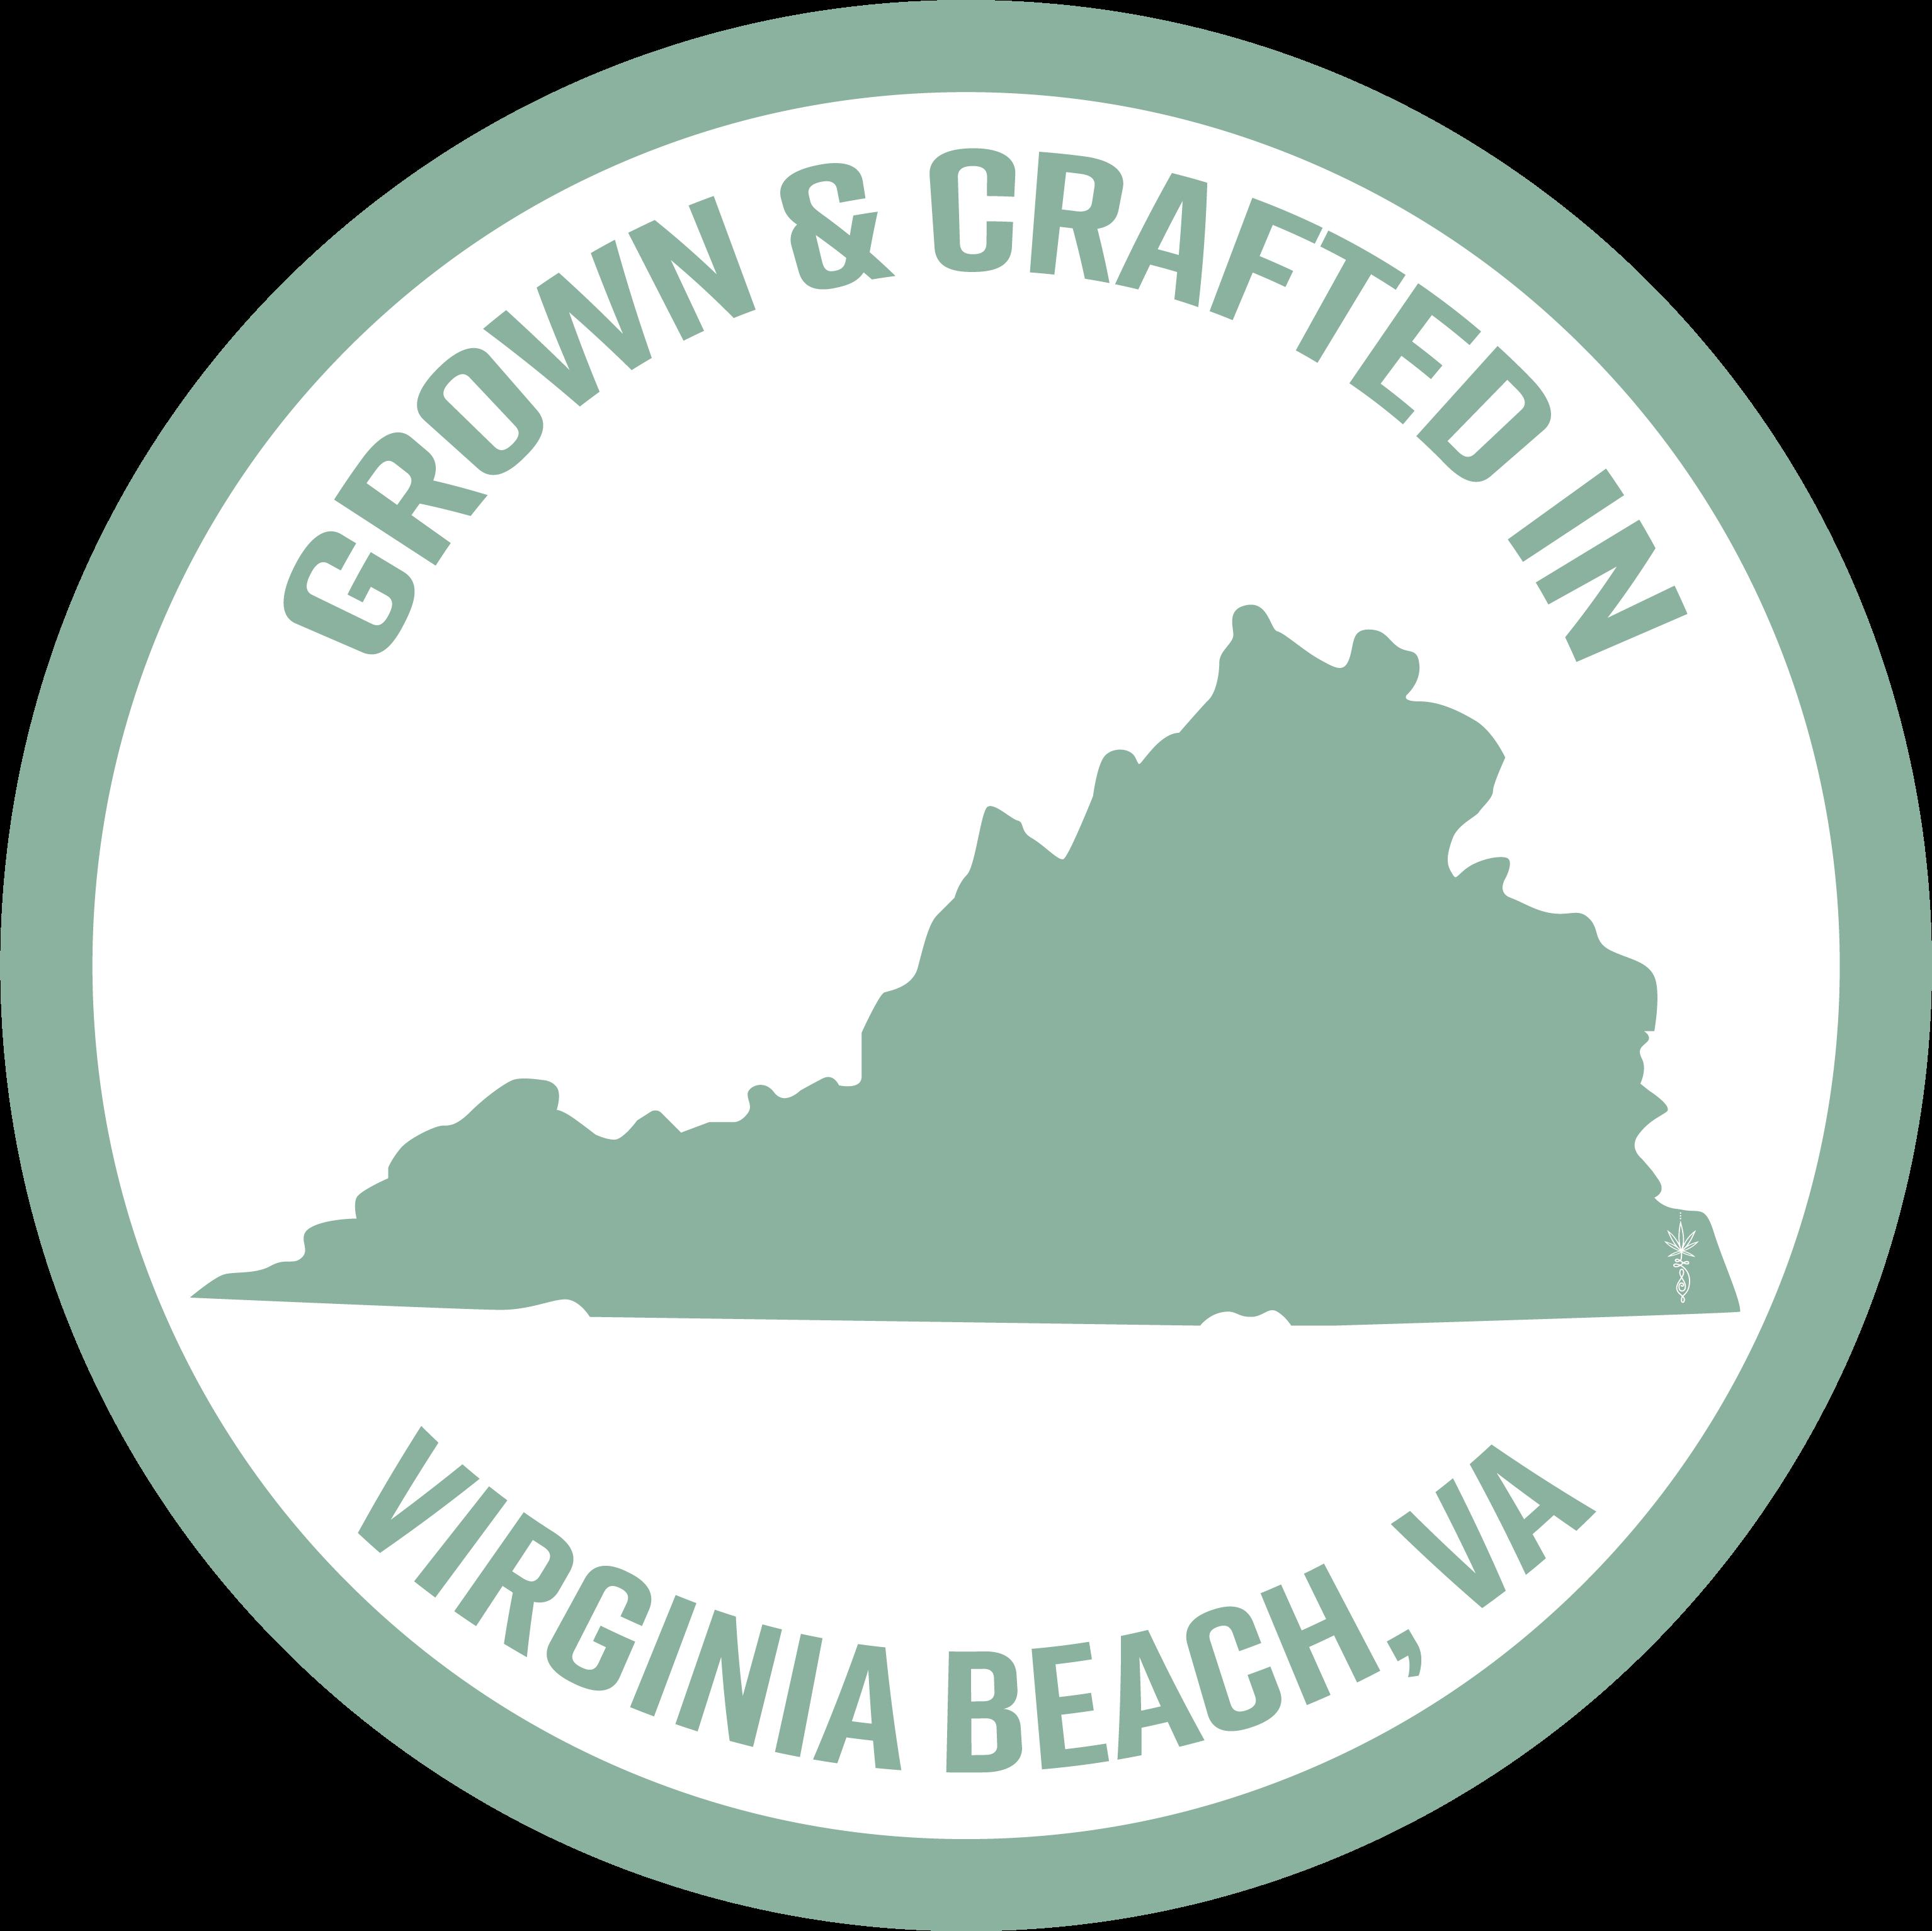 Grown & Crafted in Virginia Beach, VA